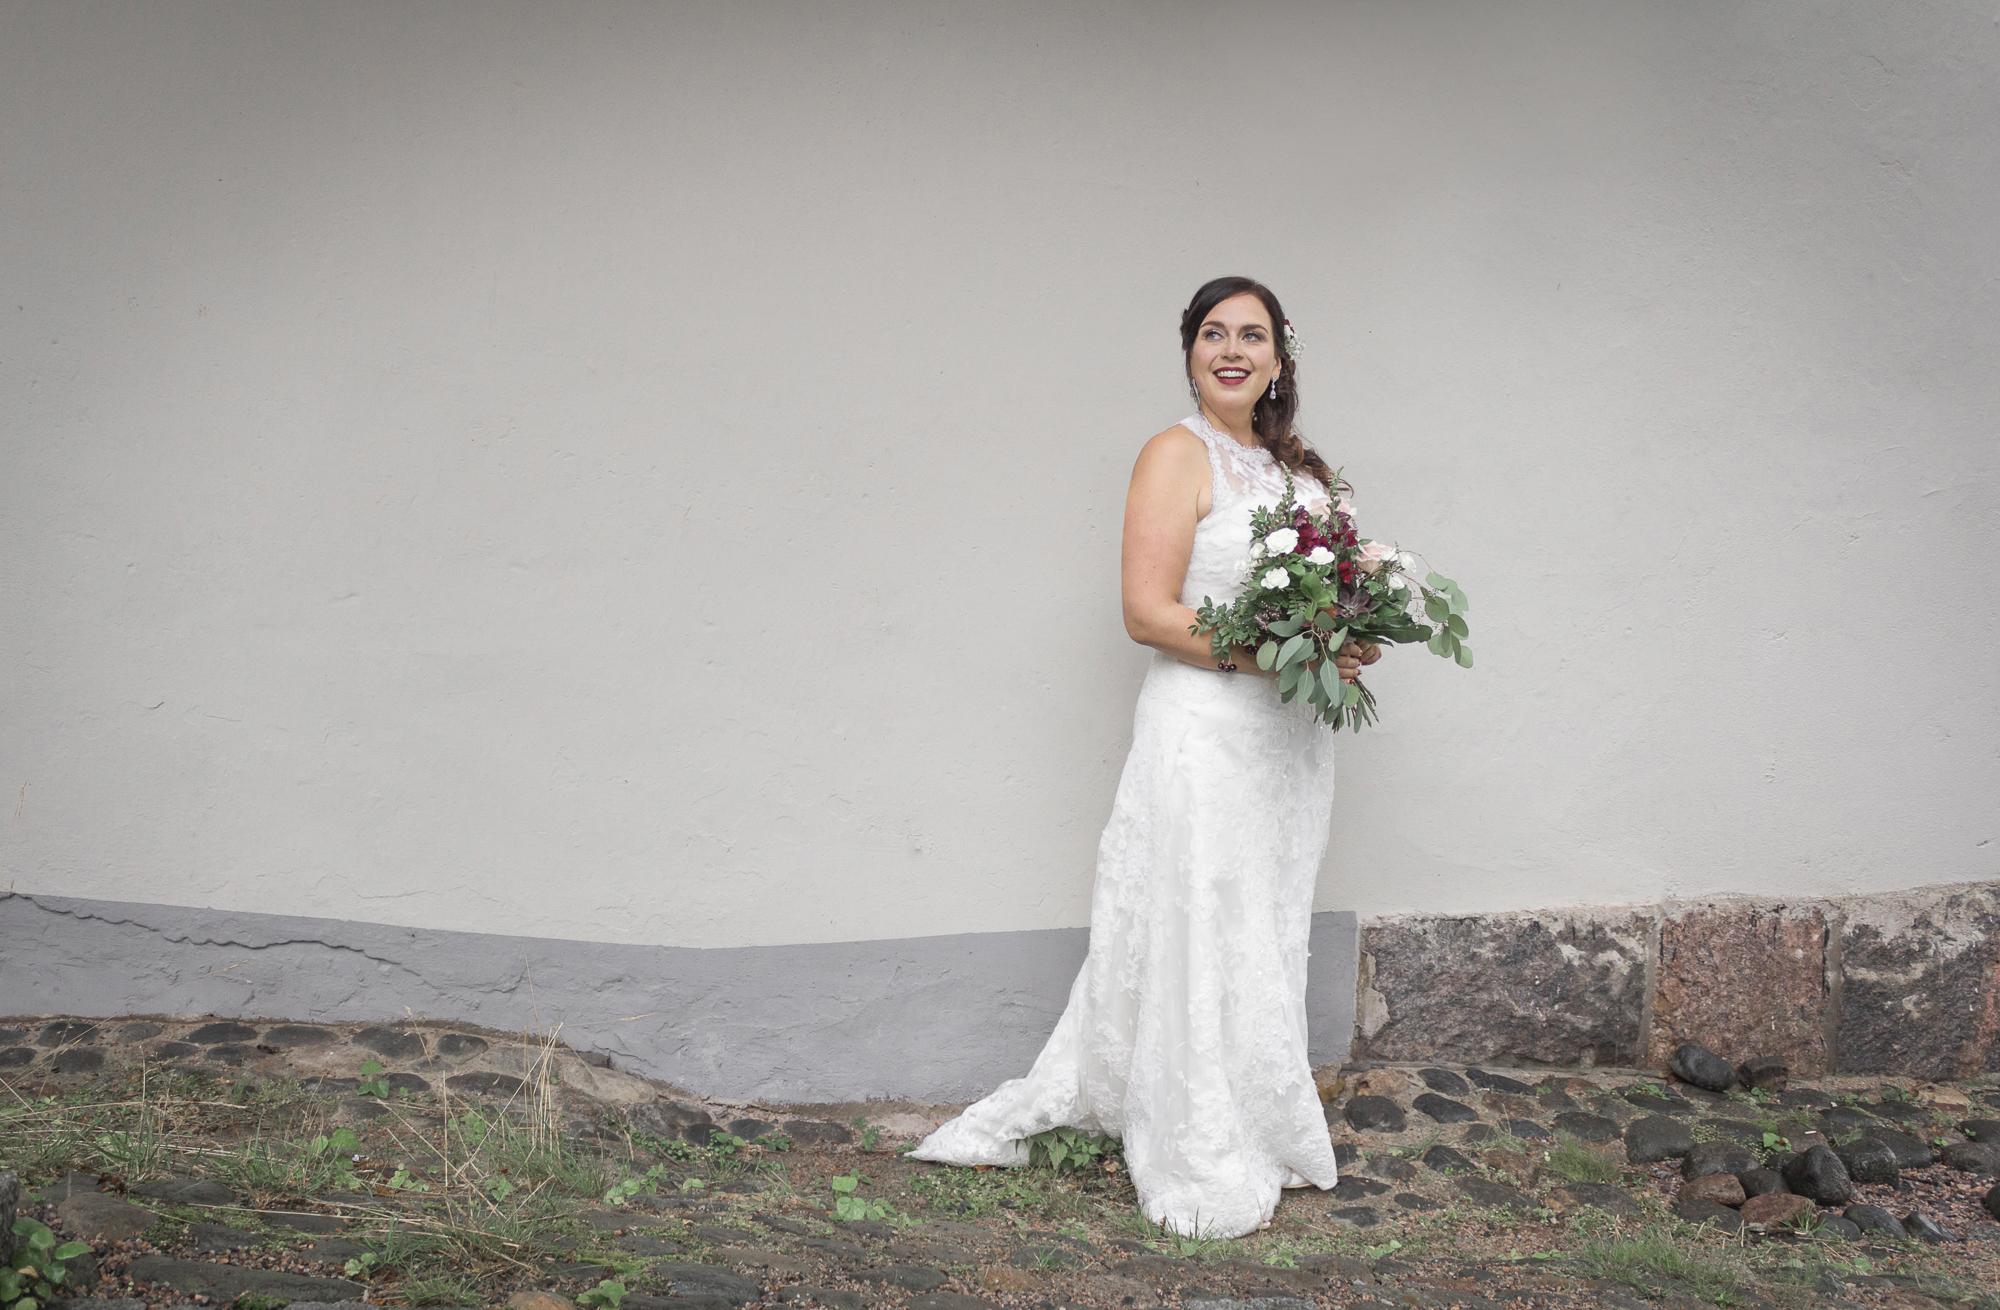 MUA: Ninna Xenia, bridal portrait of Laura Rantalainen